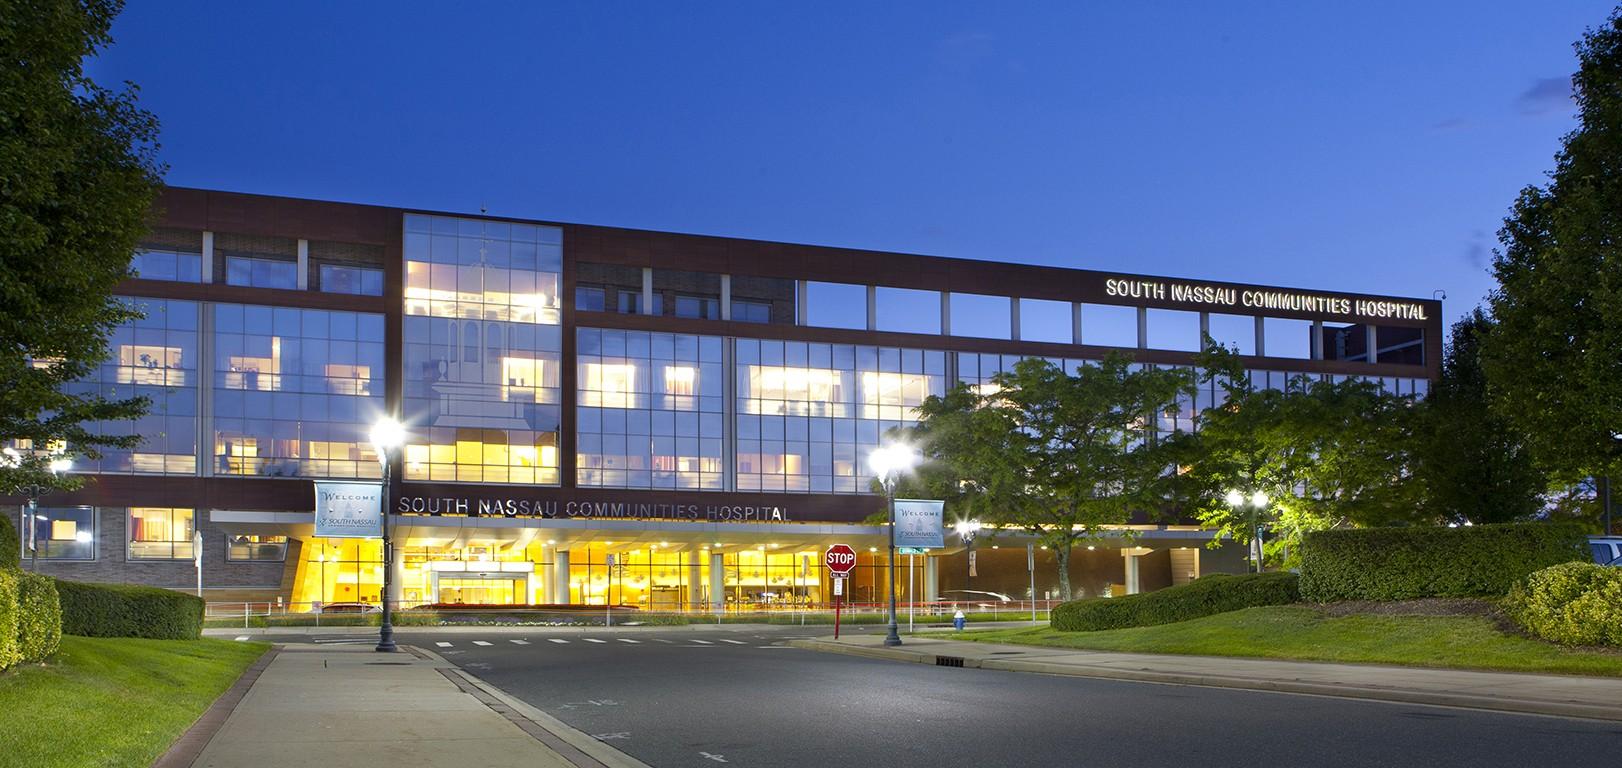 South Nassau Communities Hospital | LinkedIn